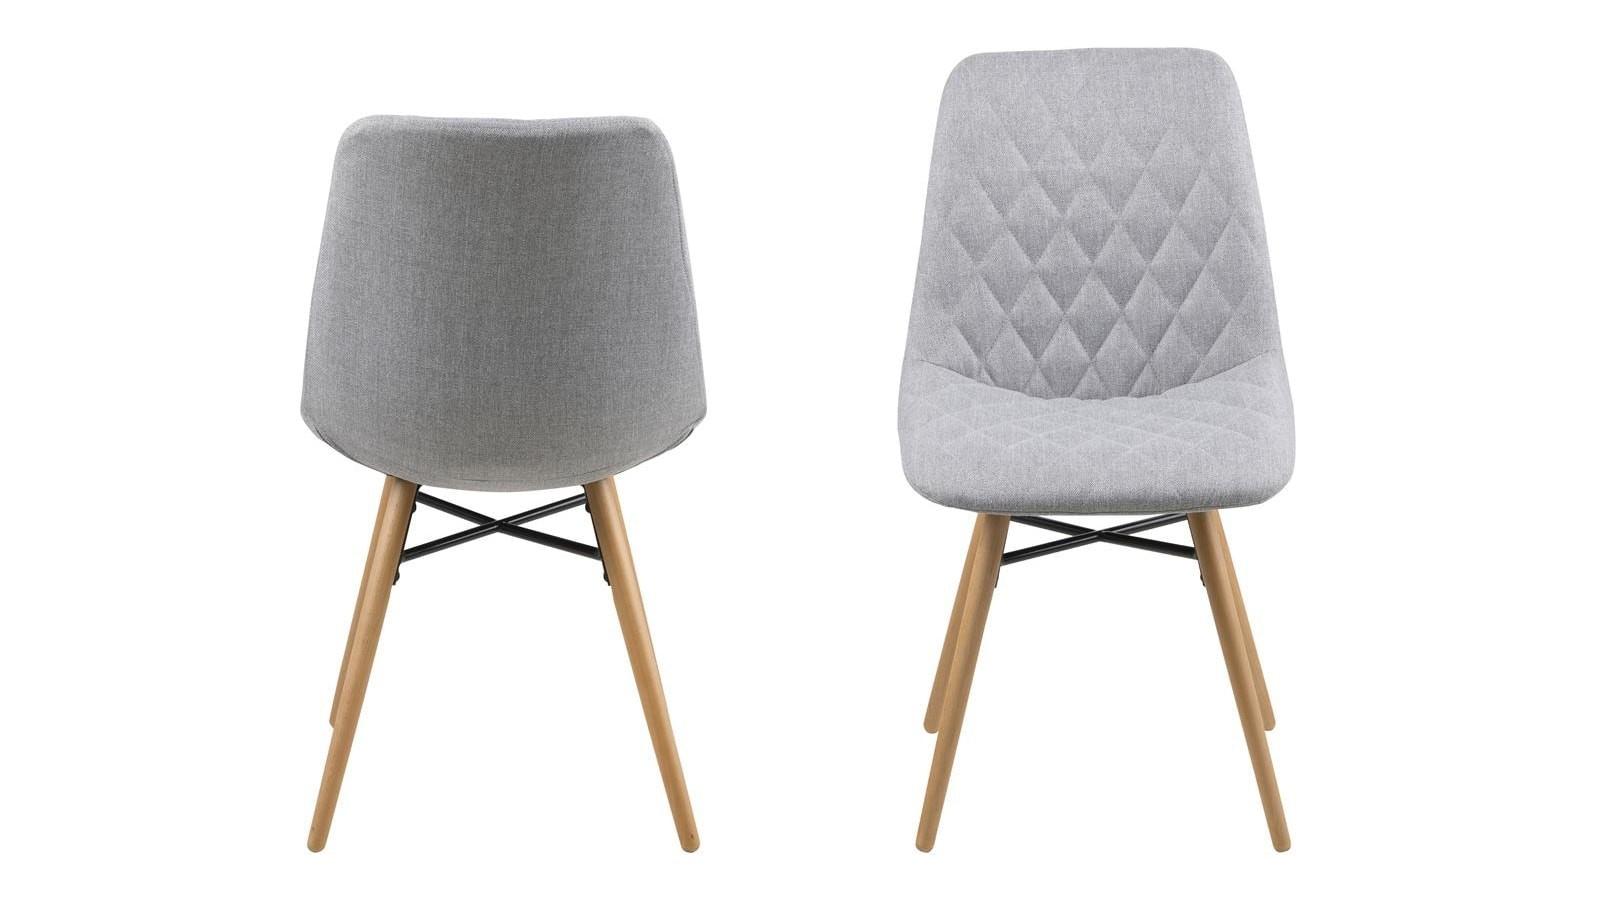 chaises scandinaves en tissu gris clair